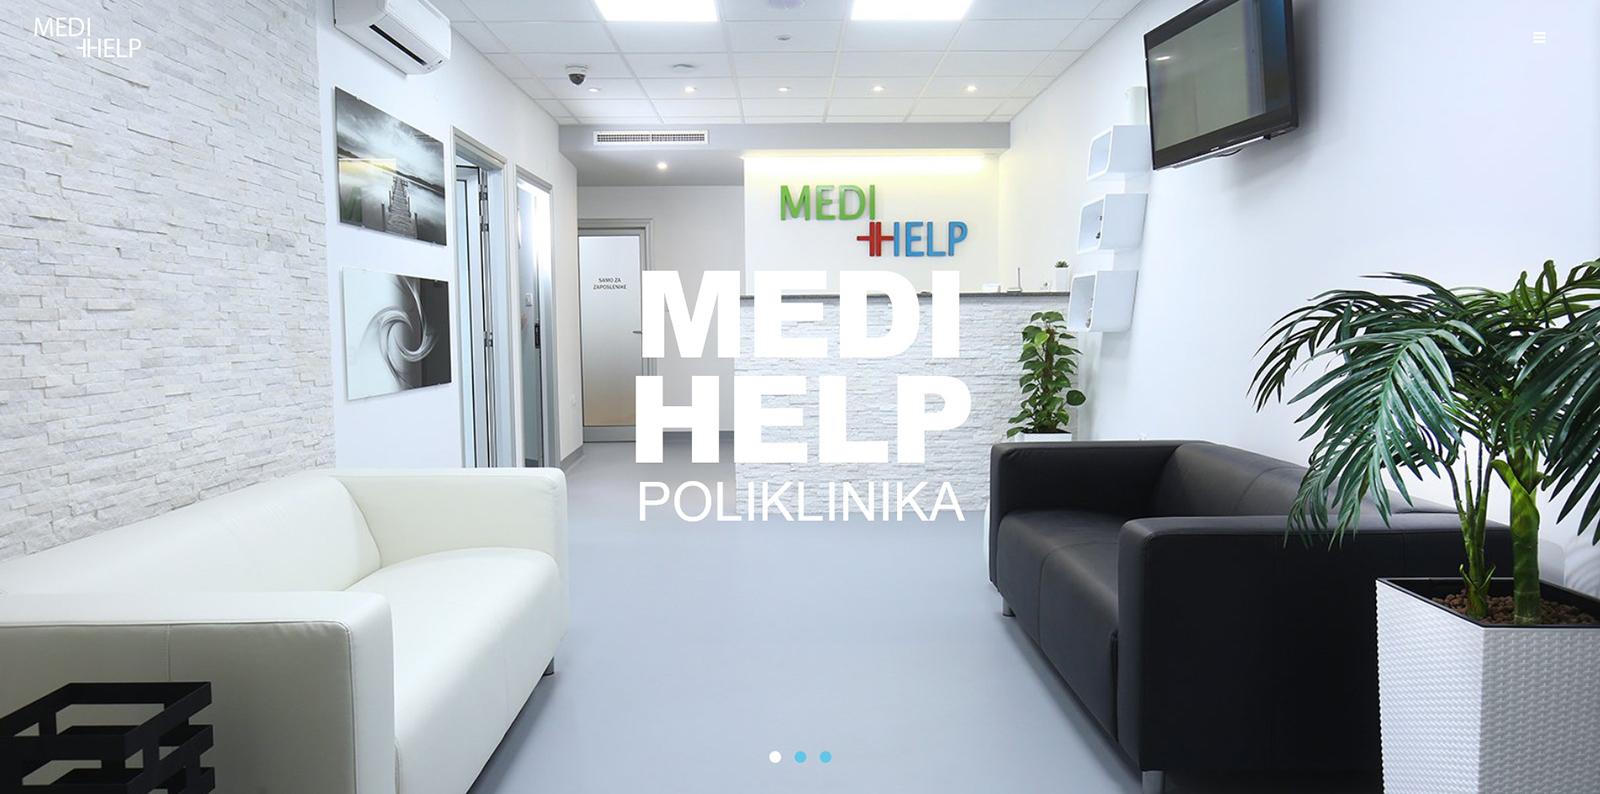 Dizajnist_Medi Help